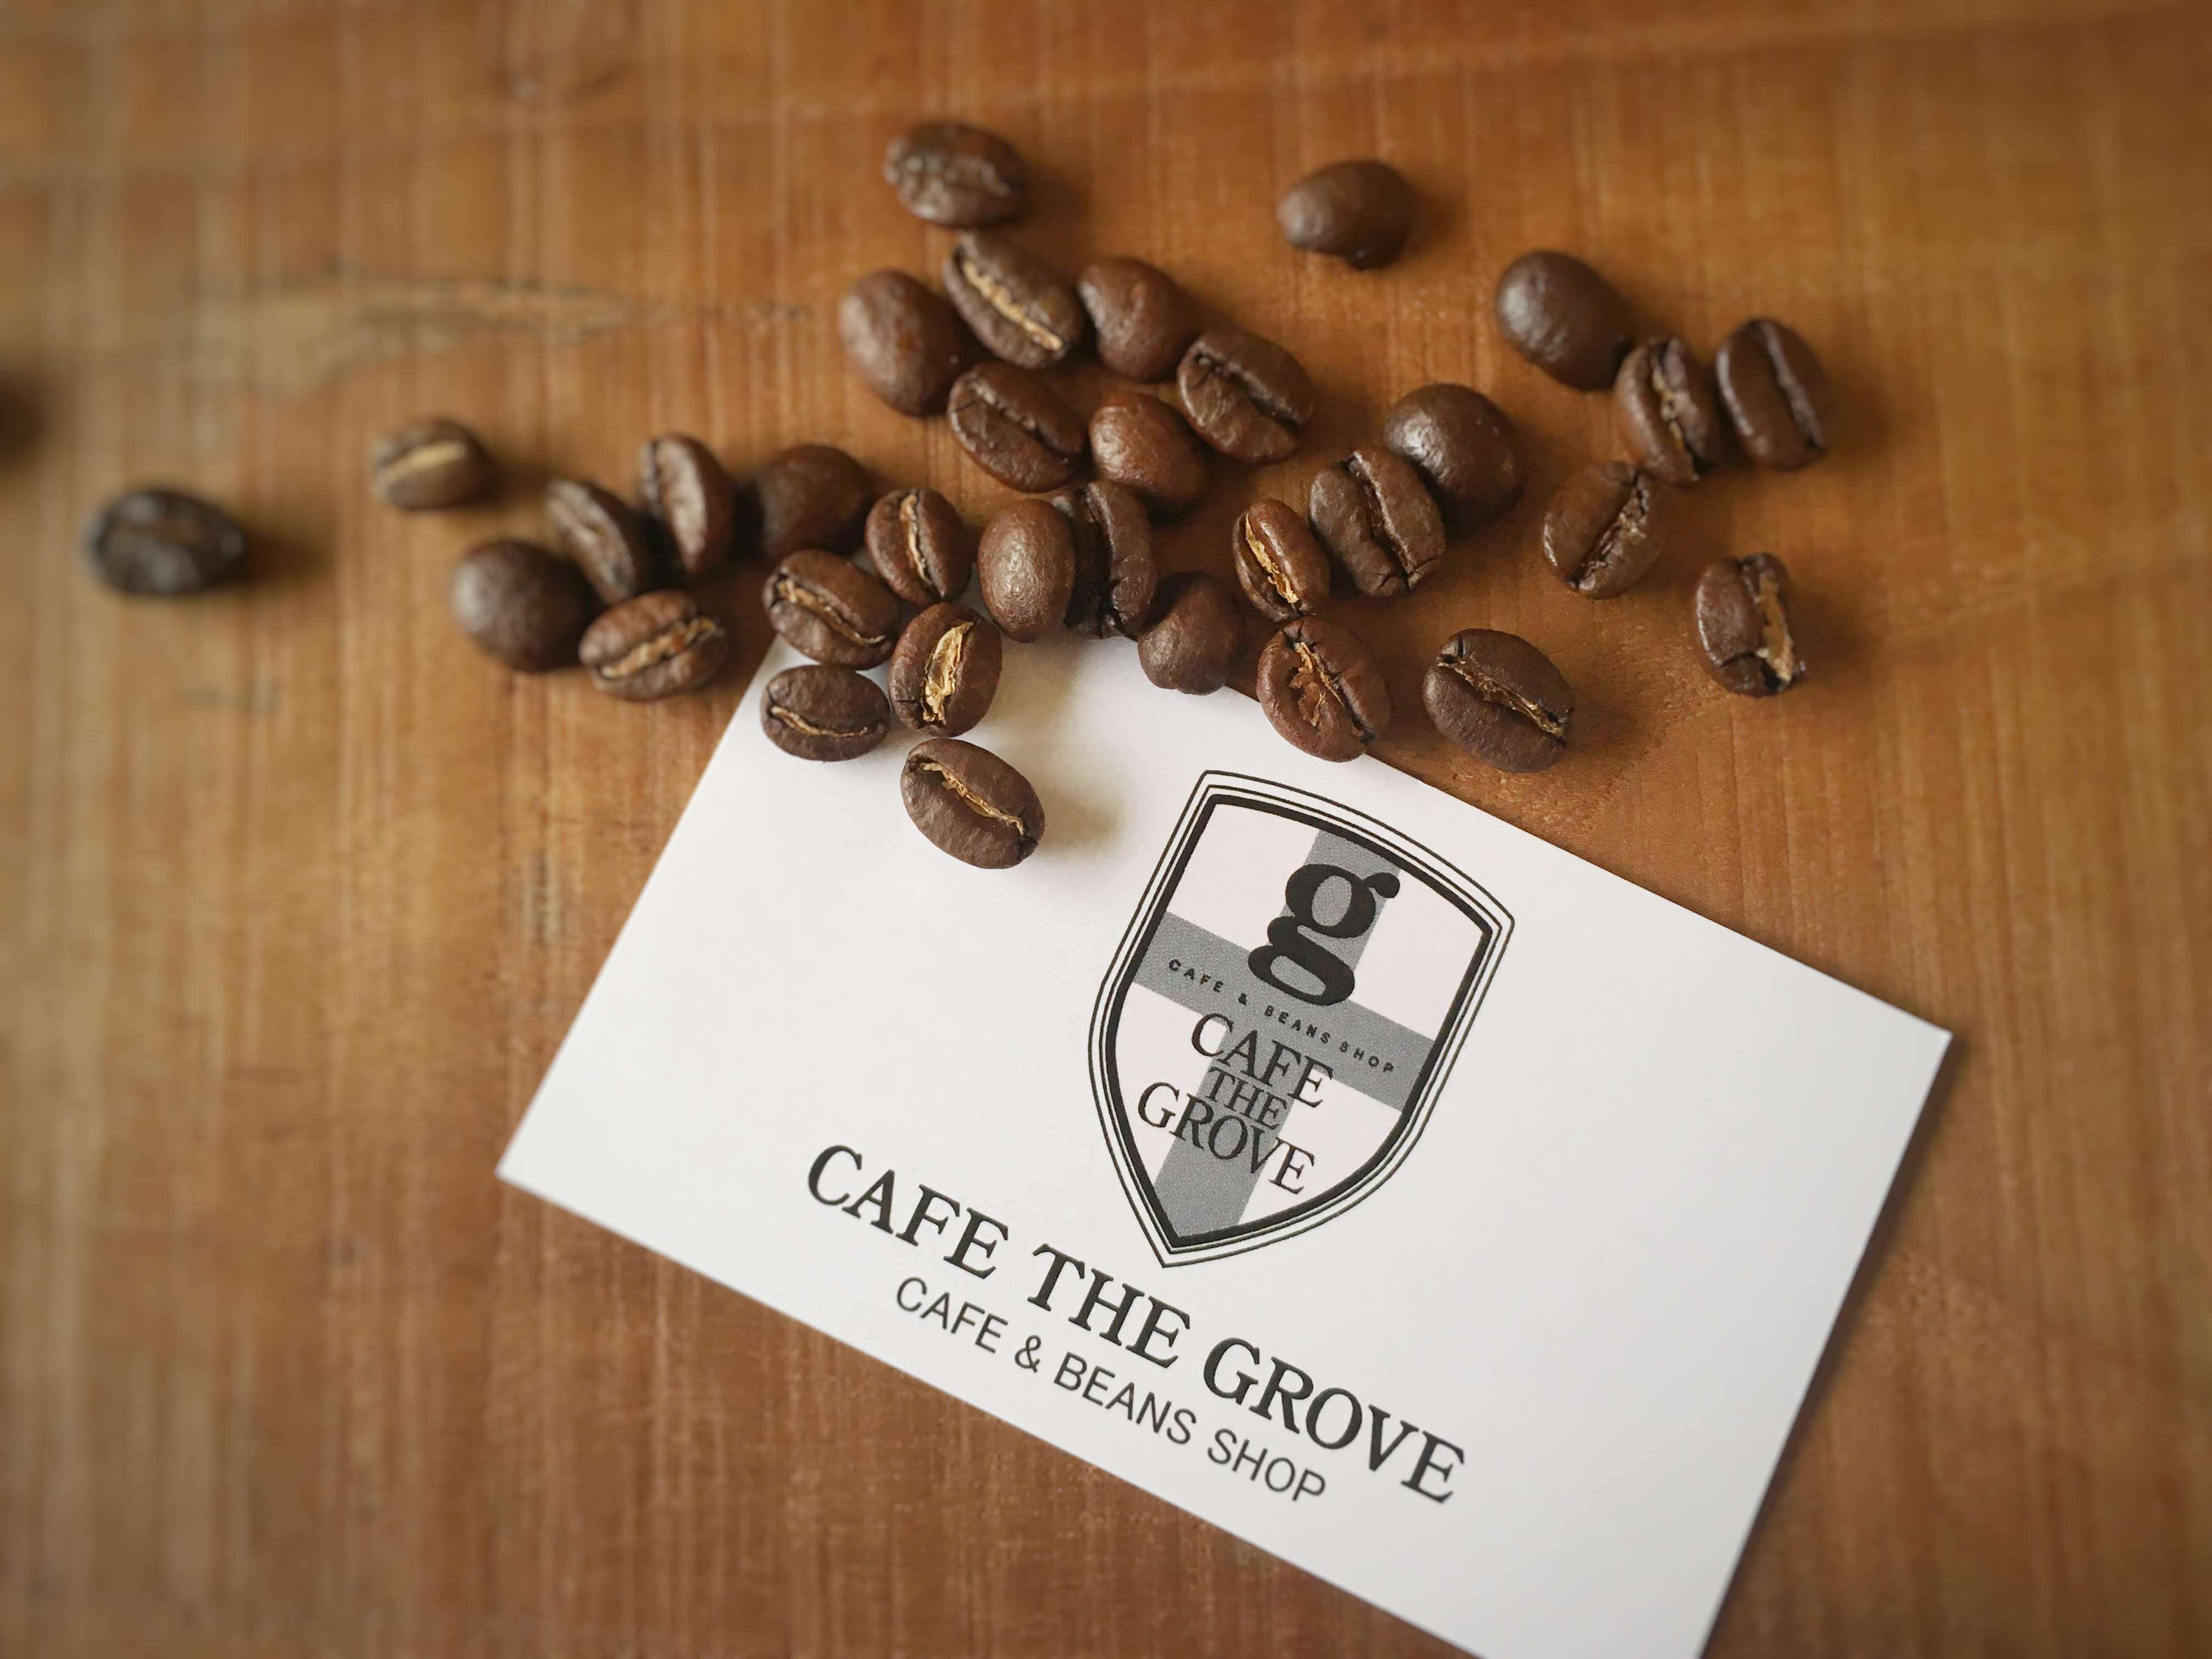 CAFE THE GROVE ショップカード